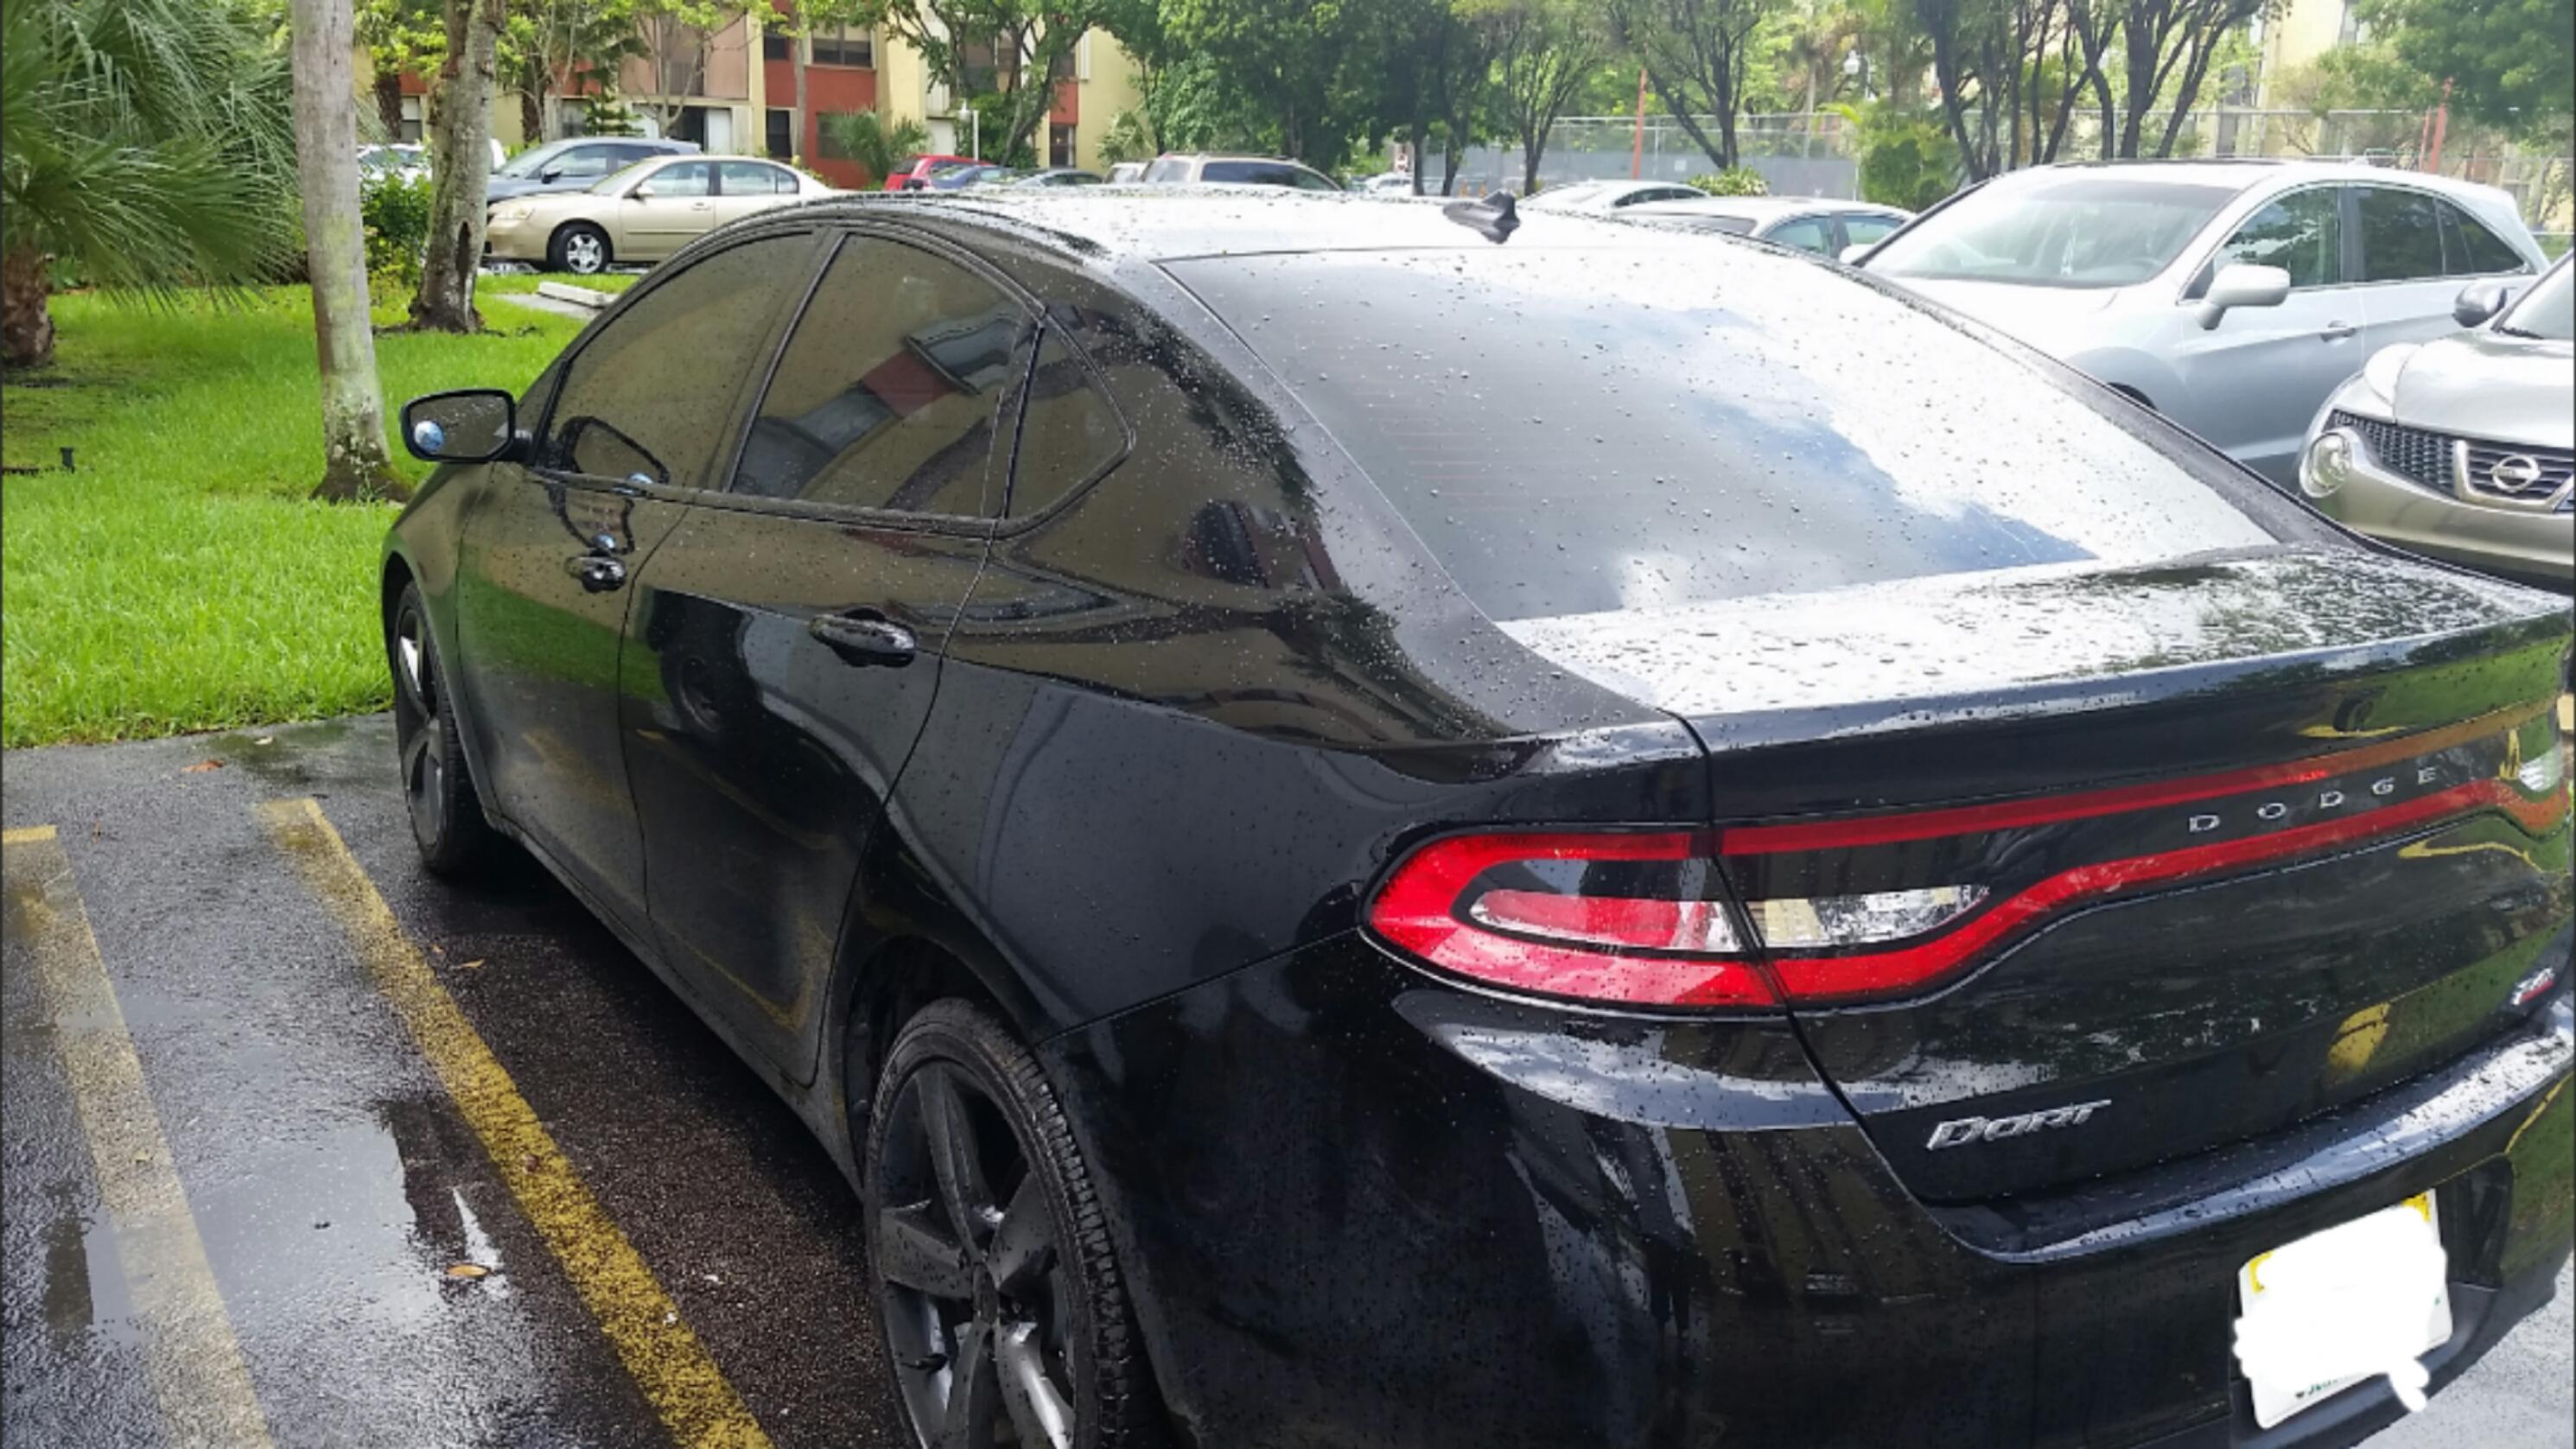 attached images - 2014 Dodge Dart Blacktop